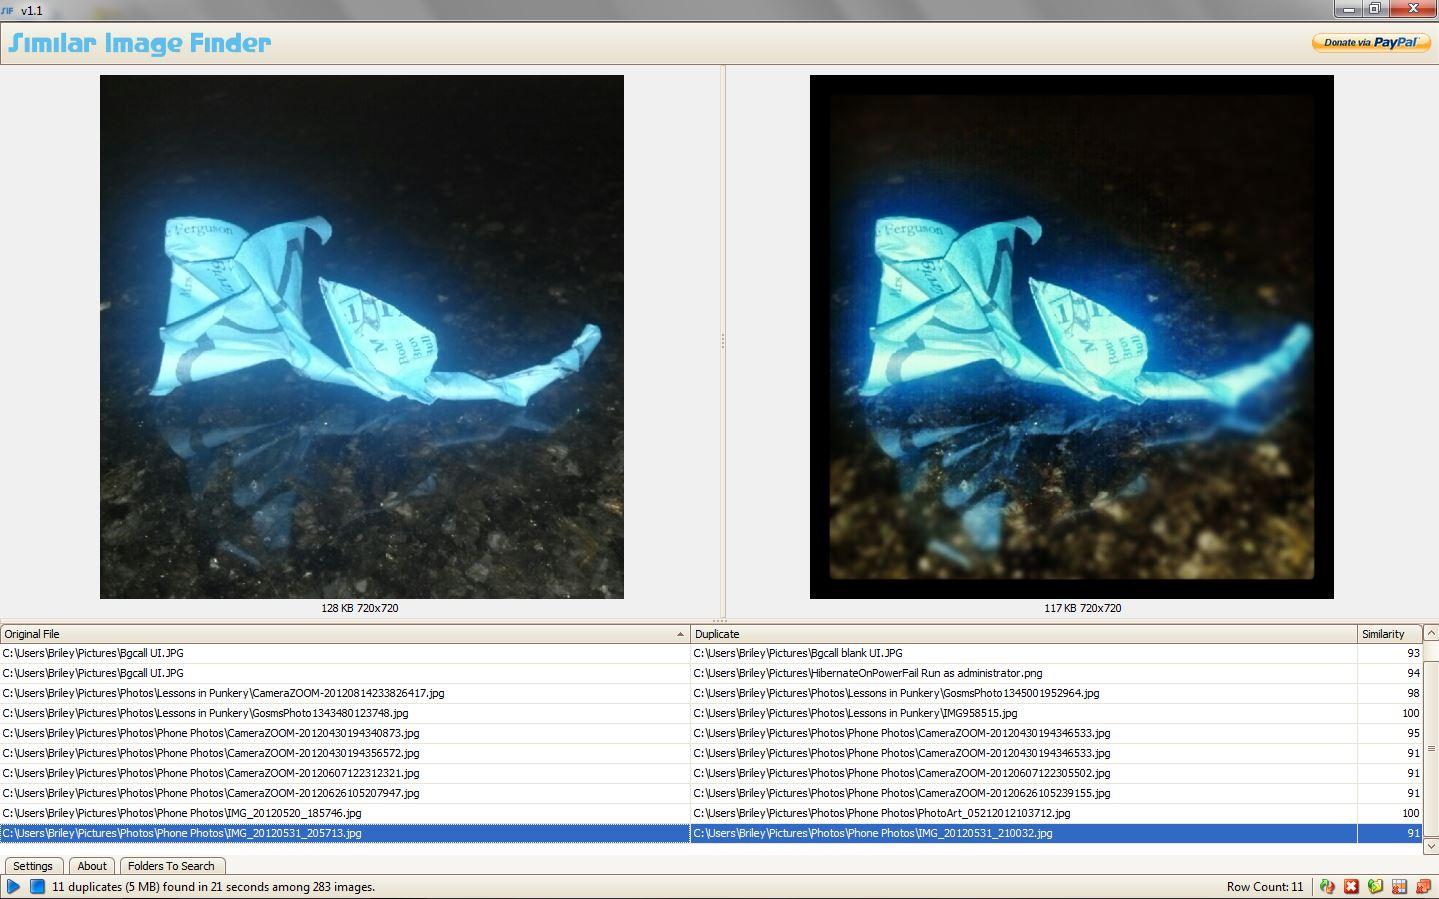 Similar Image Finder UI